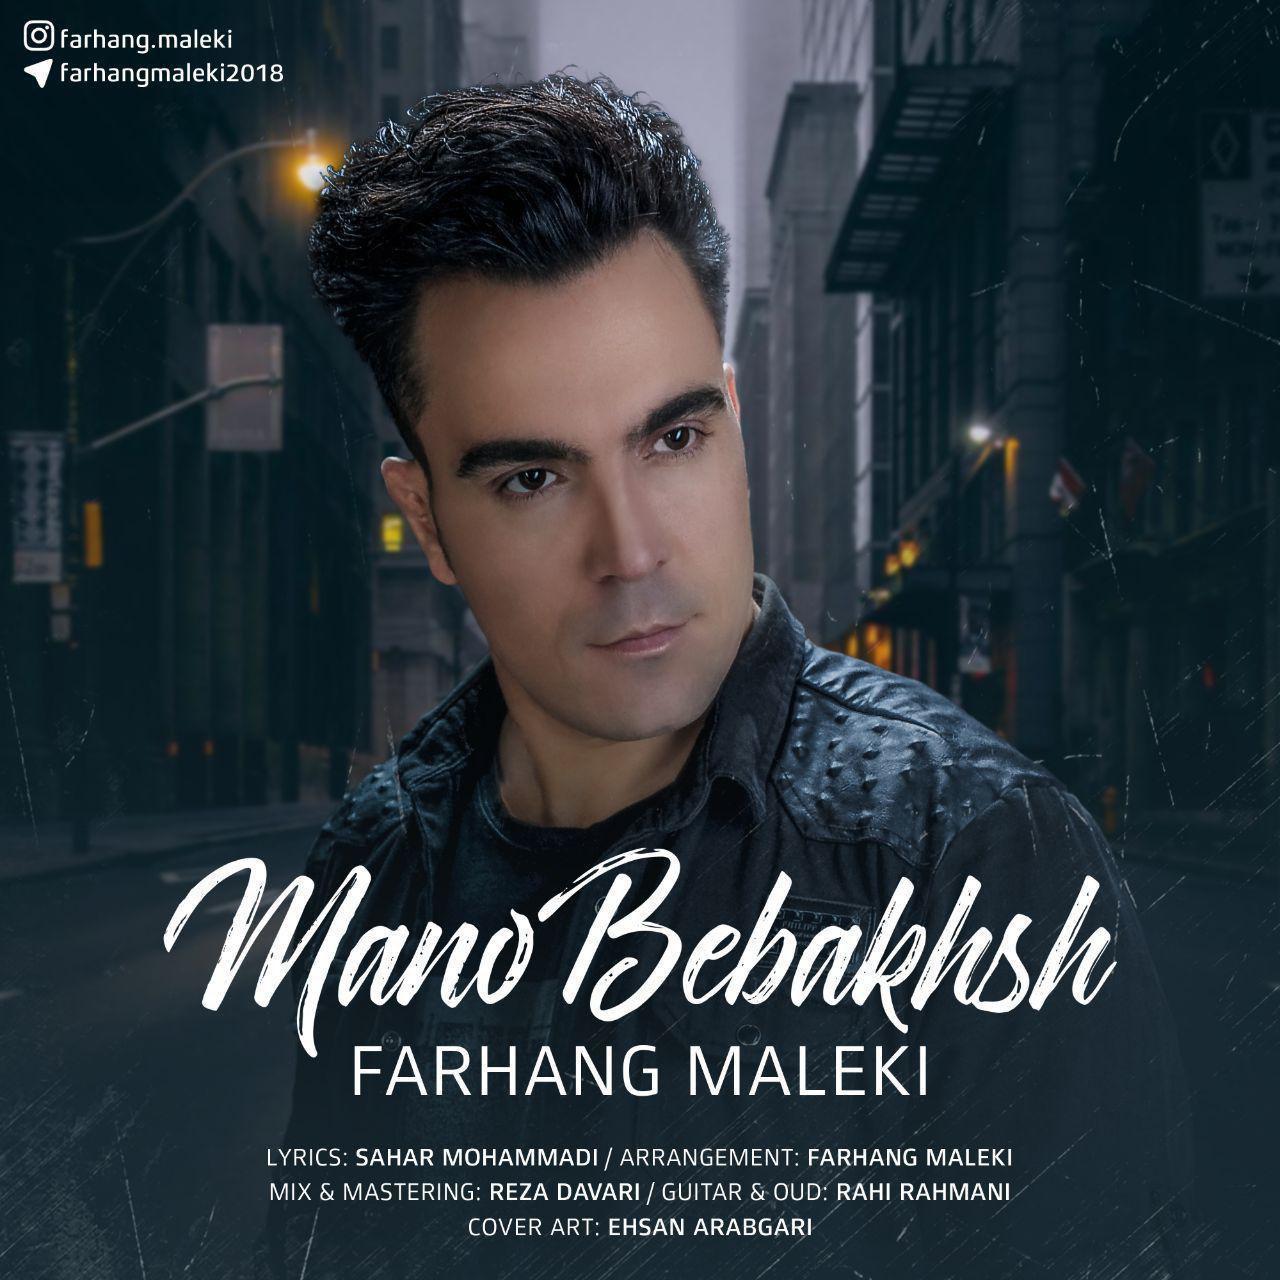 Farhang Maleki – Mano Bebakhsh